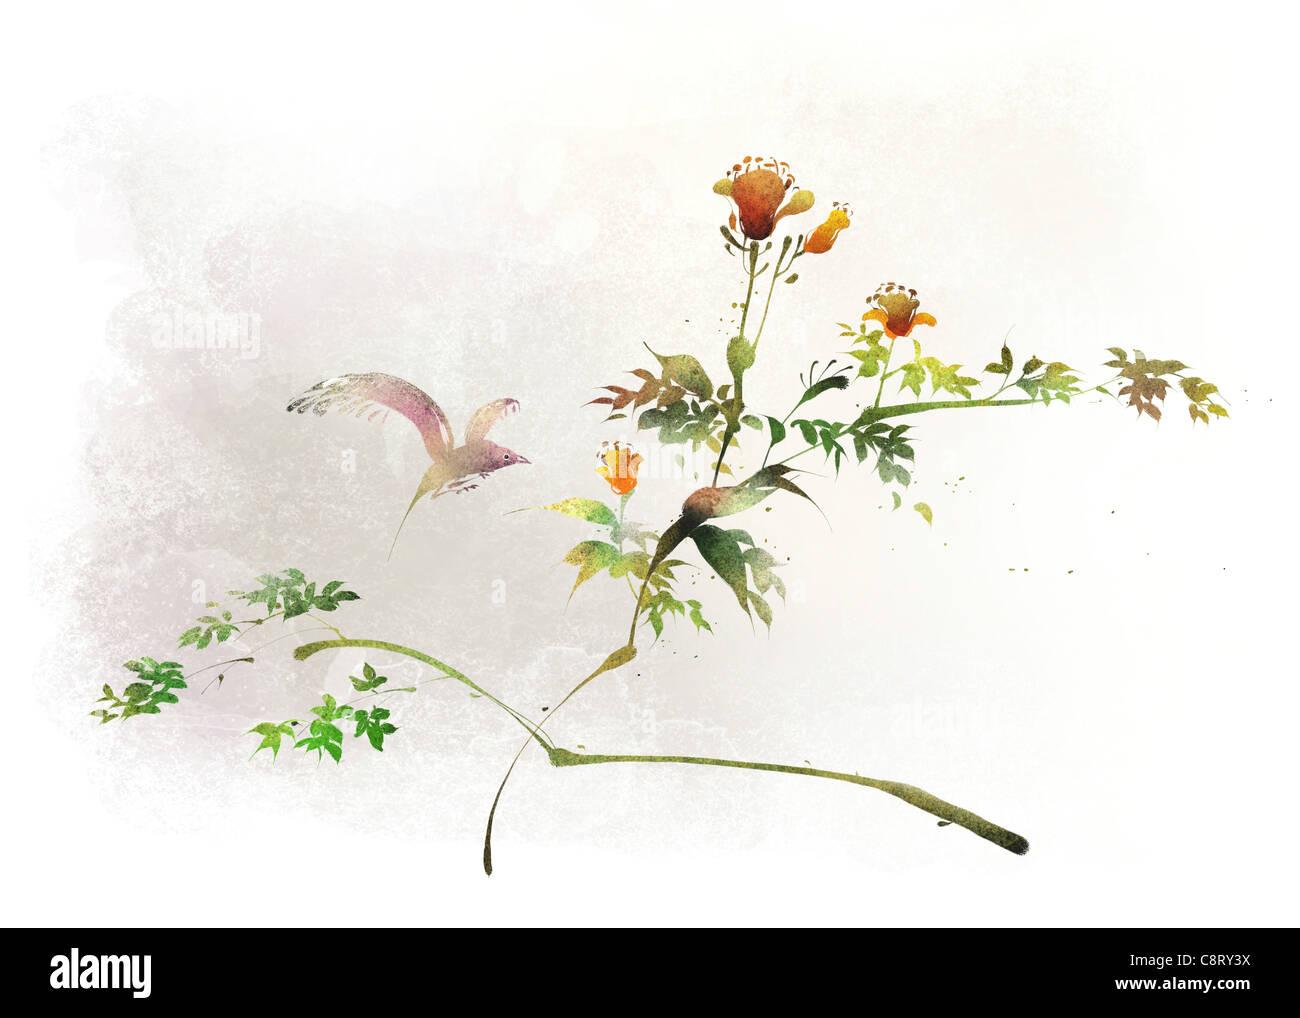 Bird On Flowering Tree - Stock Image